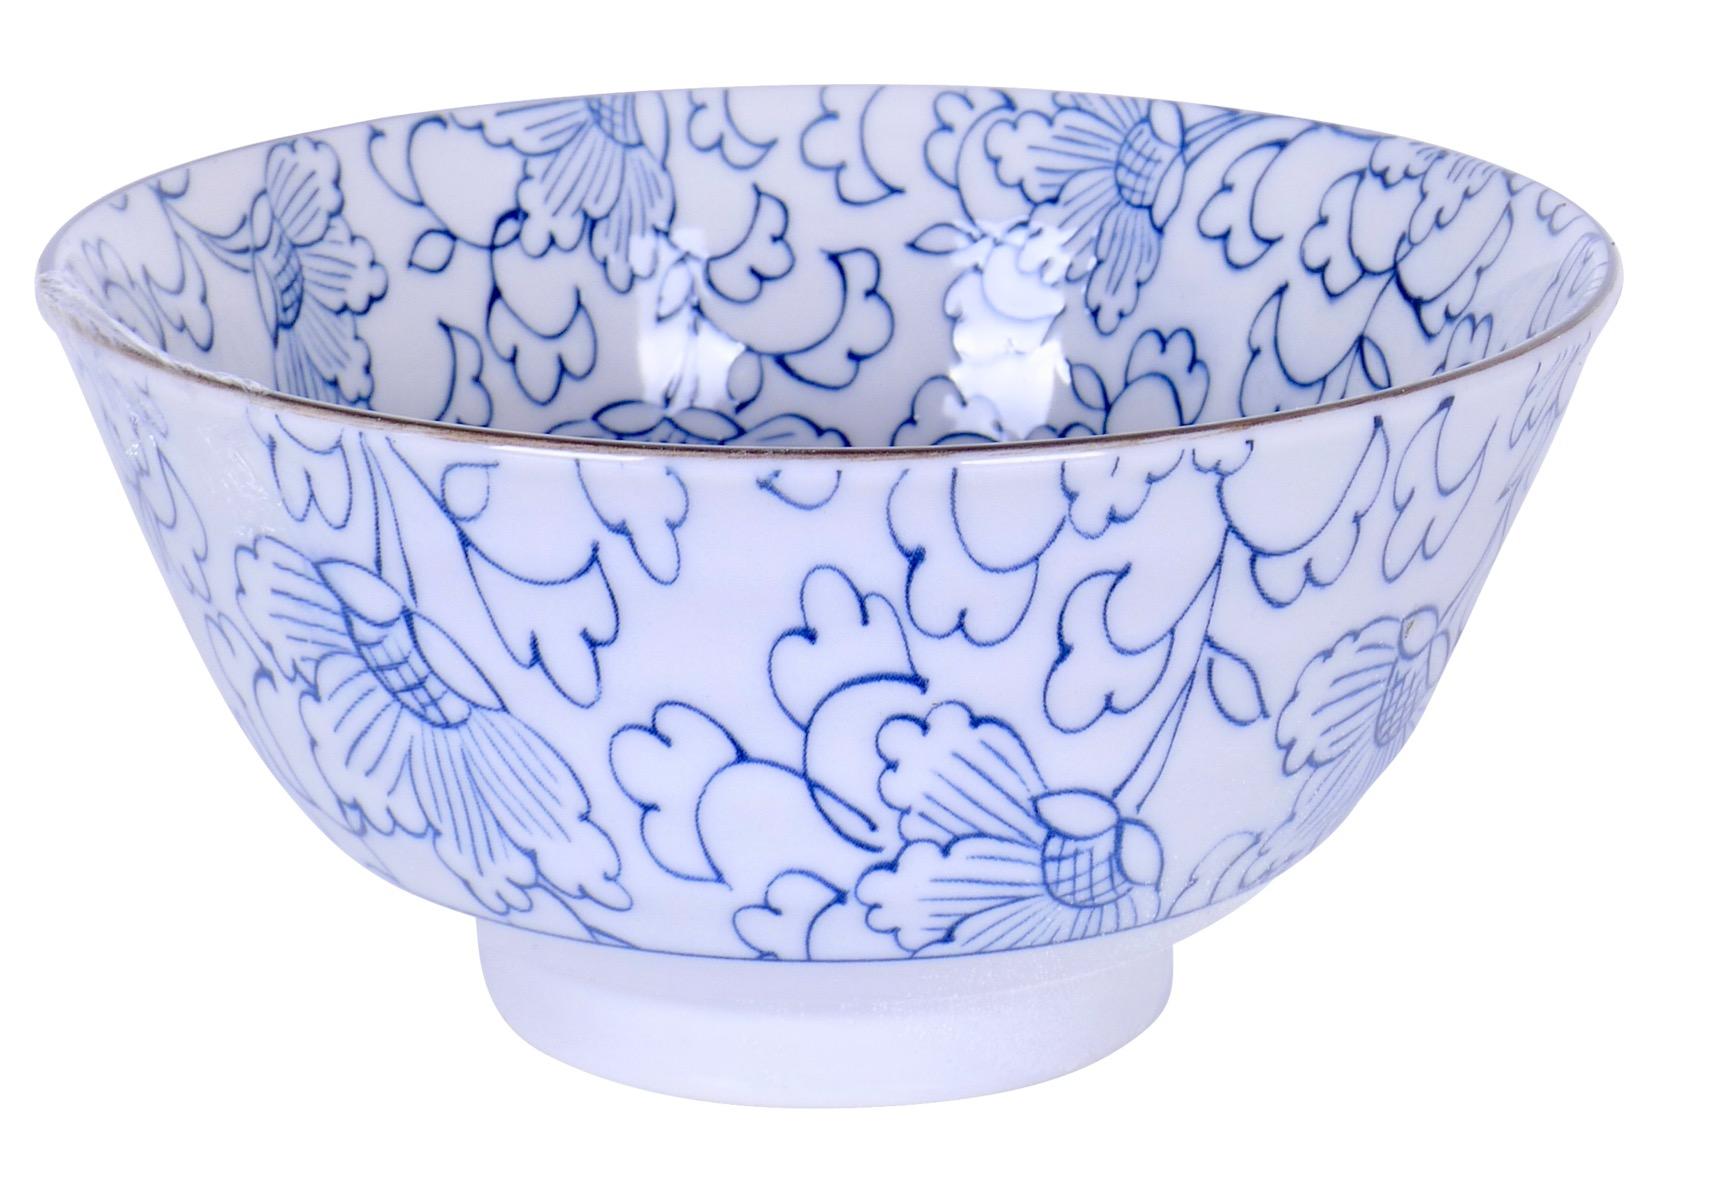 Image of Porcelain Bowls, Floral White, 4.75-Inch